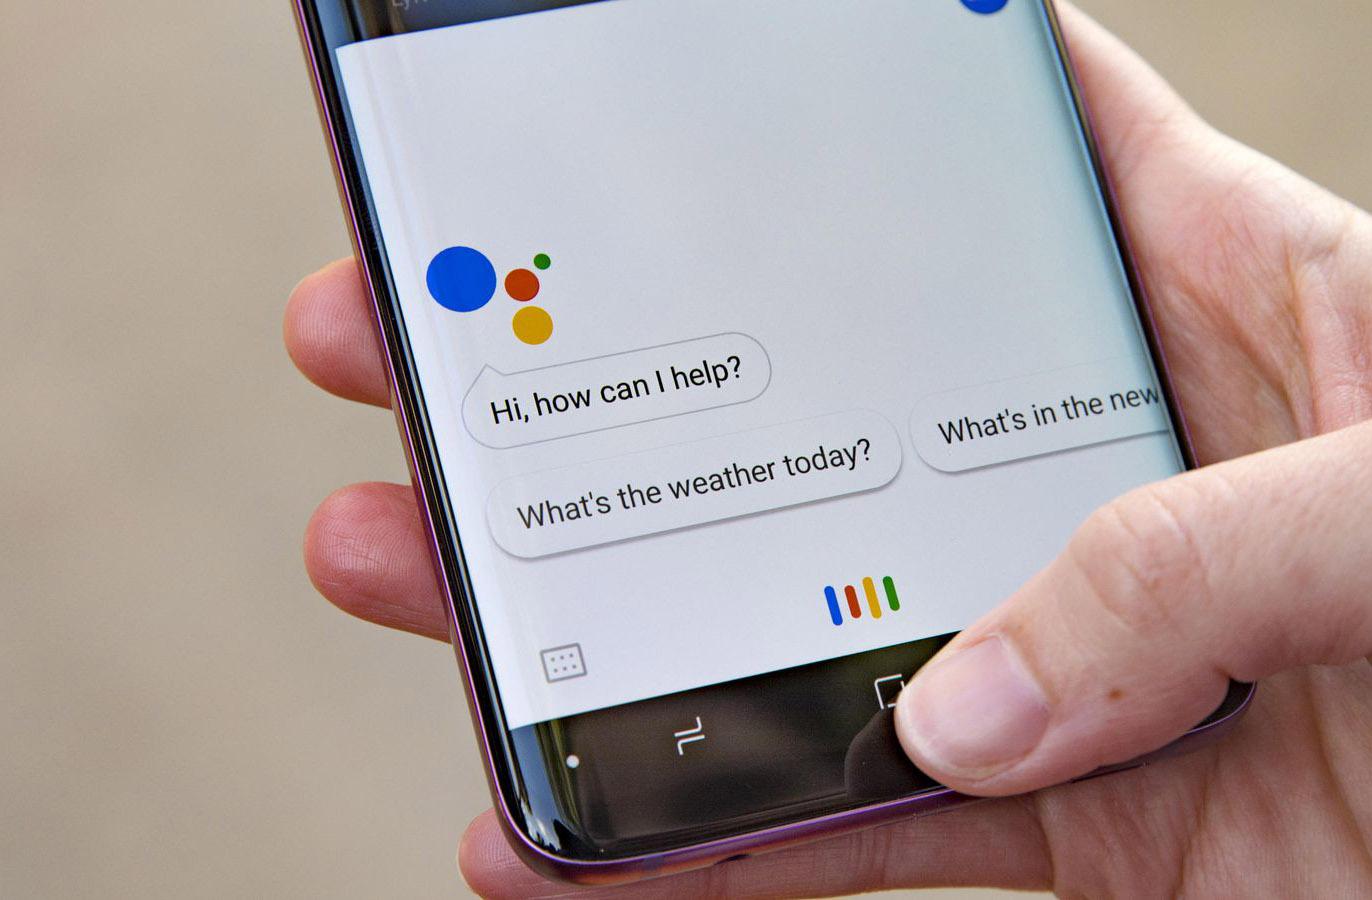 قابلیت Ambient Mode دستیار صوتی گوگل را بیشتر بشناسید +تصاویر